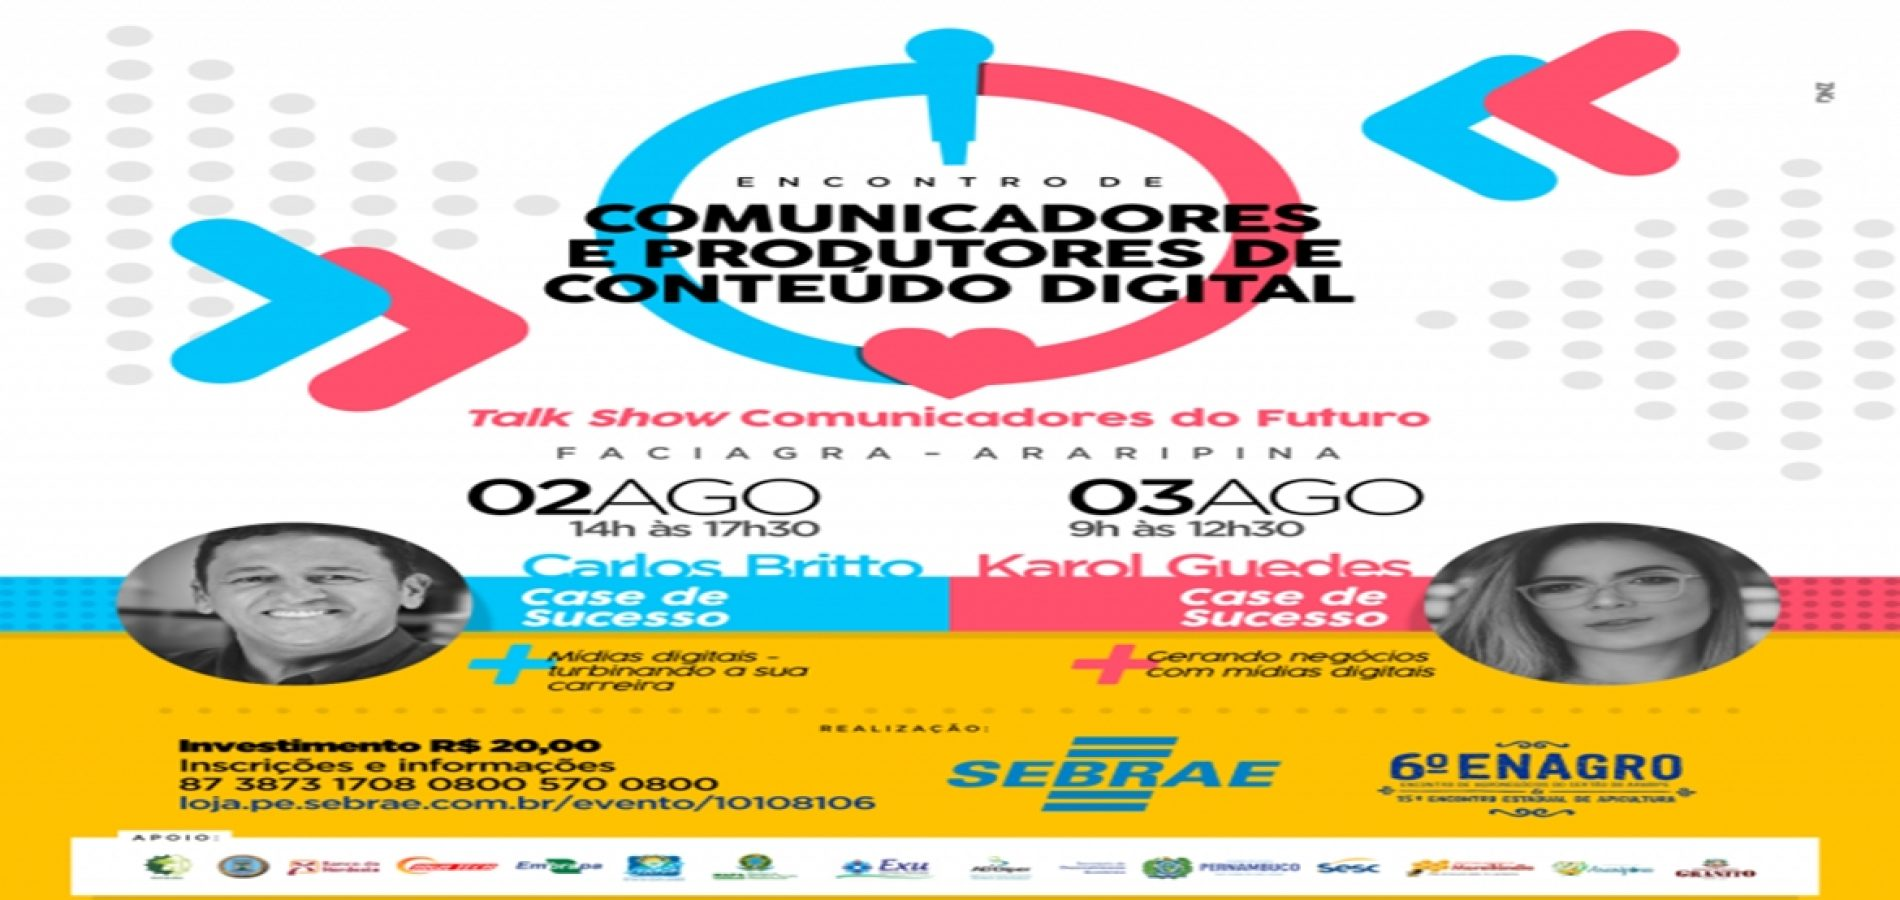 Sebrae de Araripina-PE promove encontro para comunicadores e influenciadores digitais